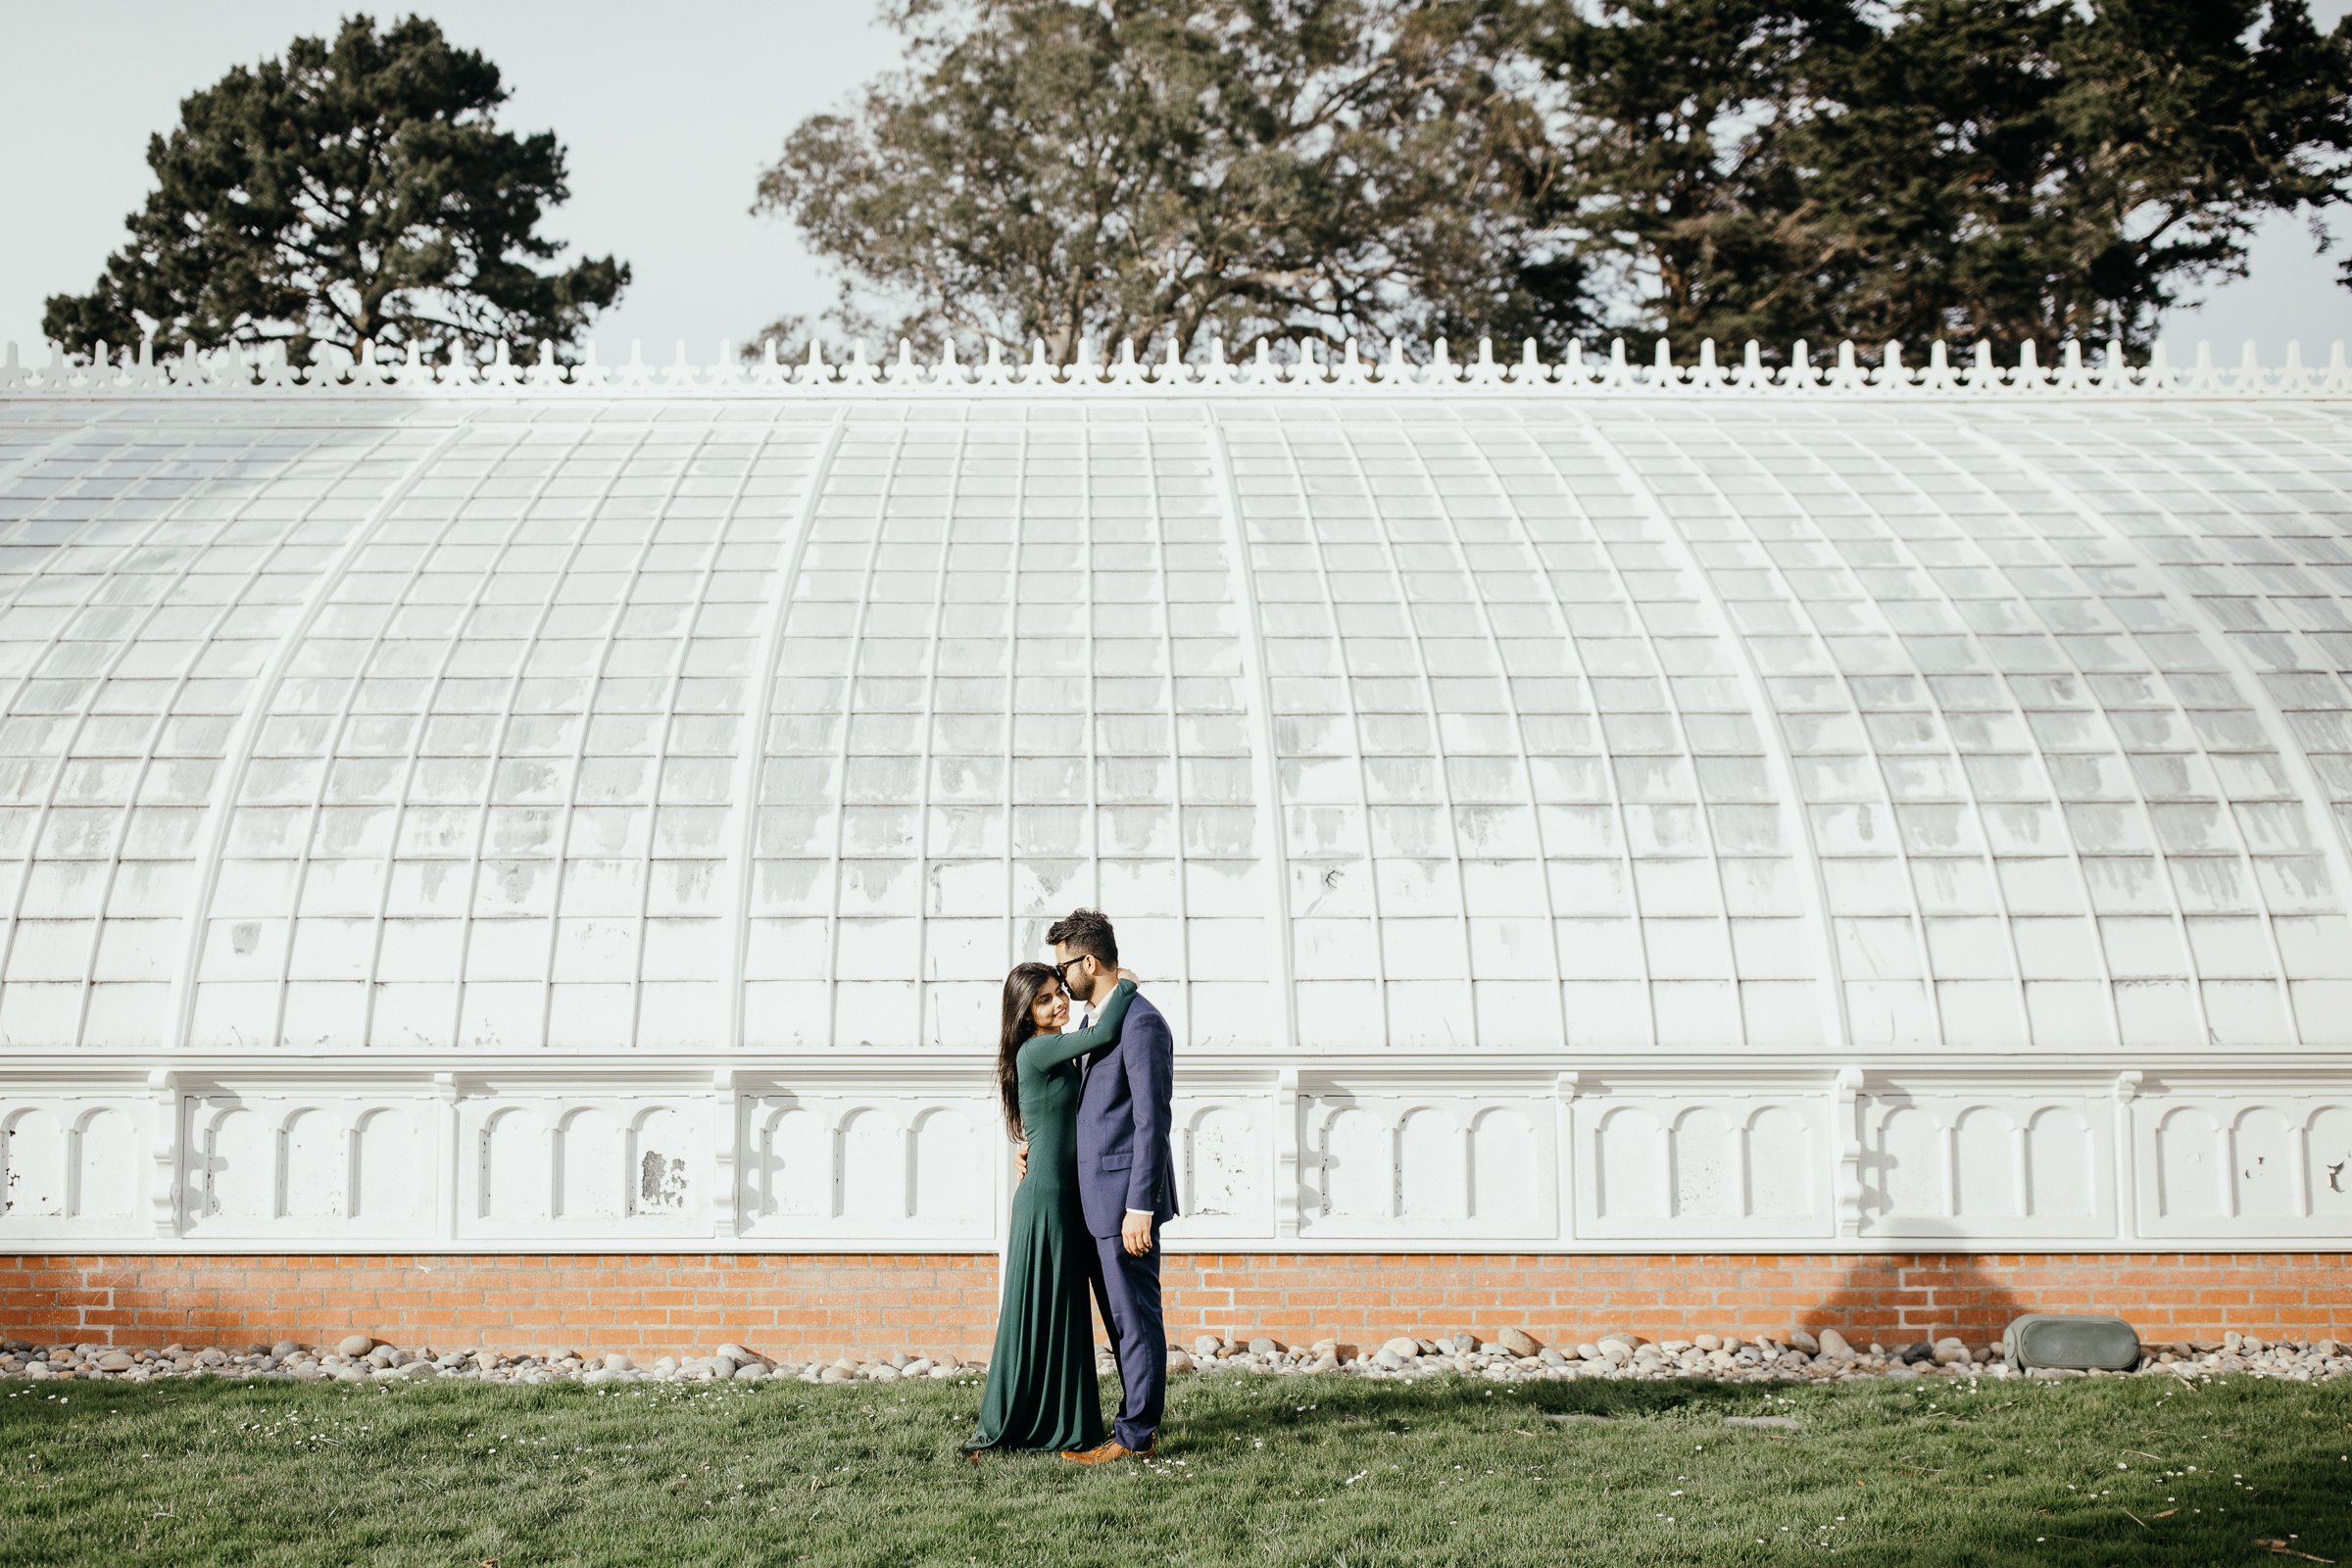 Stories-thez  photography: San Francisco Wedding photographer